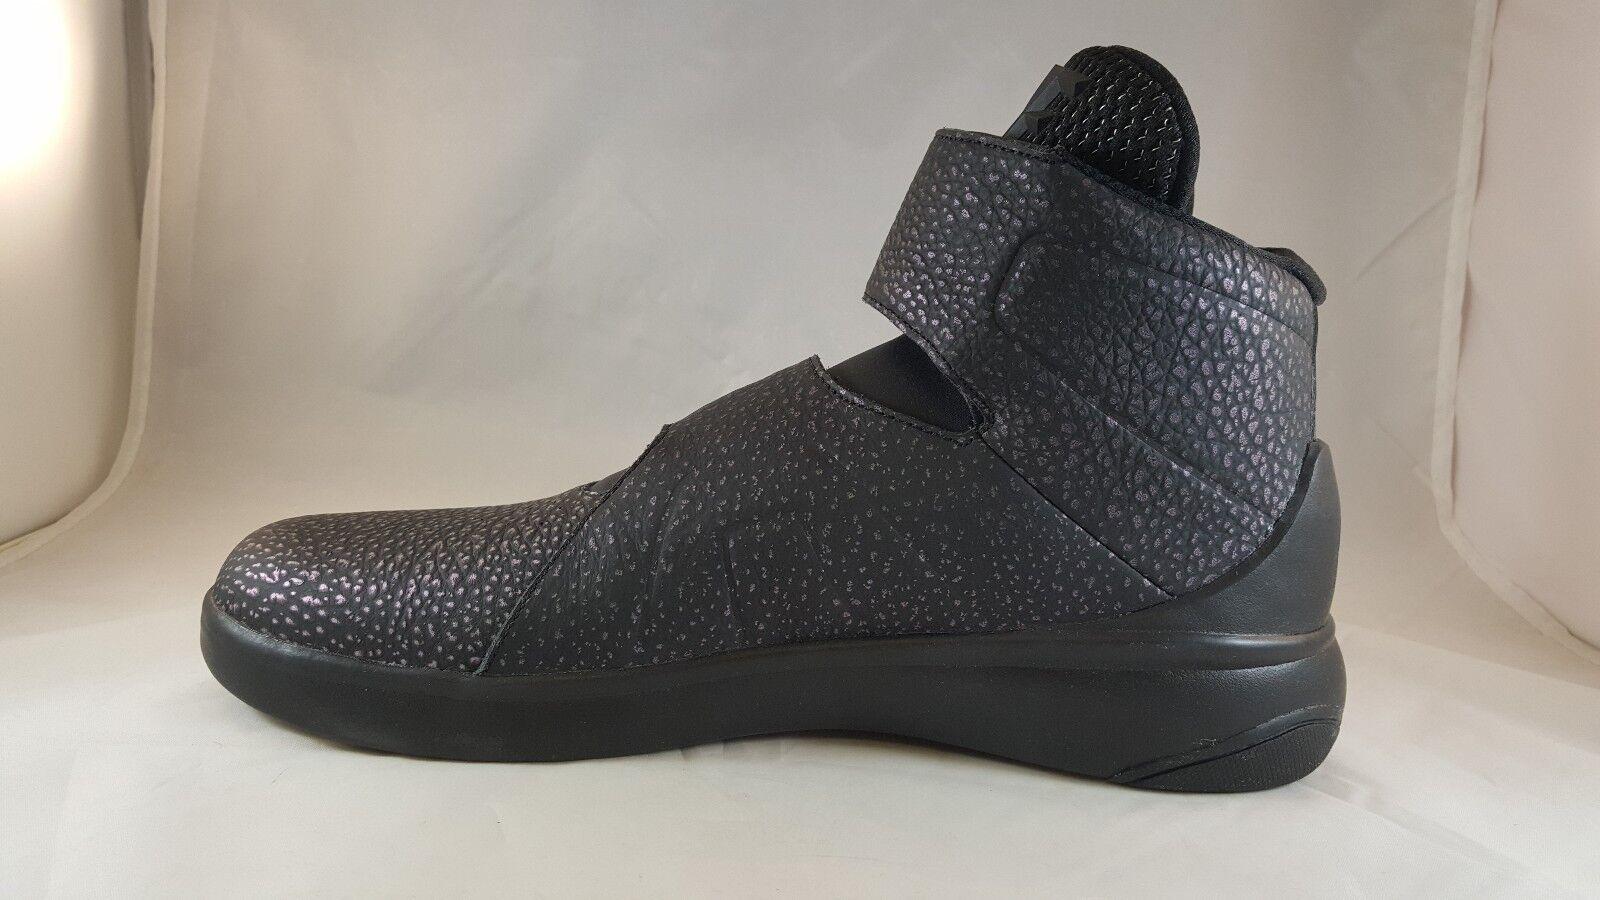 Nike Marxman PRM AS QS QS QS Men's Basketball shoes 840597 001 Size 13 30cccc